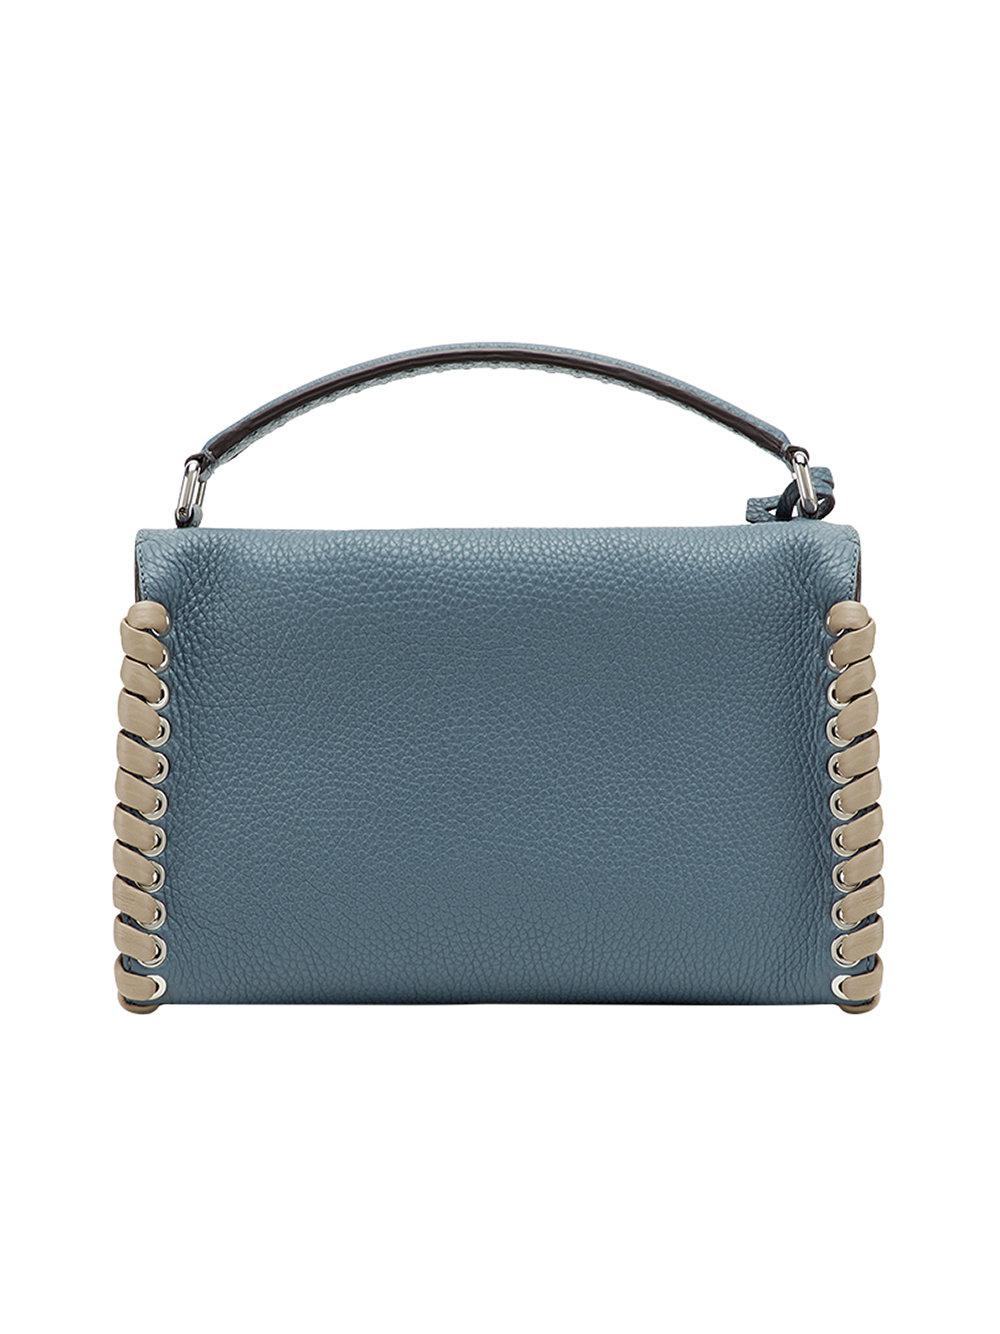 7e2f4502bc Fendi Lei Selleria Bag in Blue - Lyst